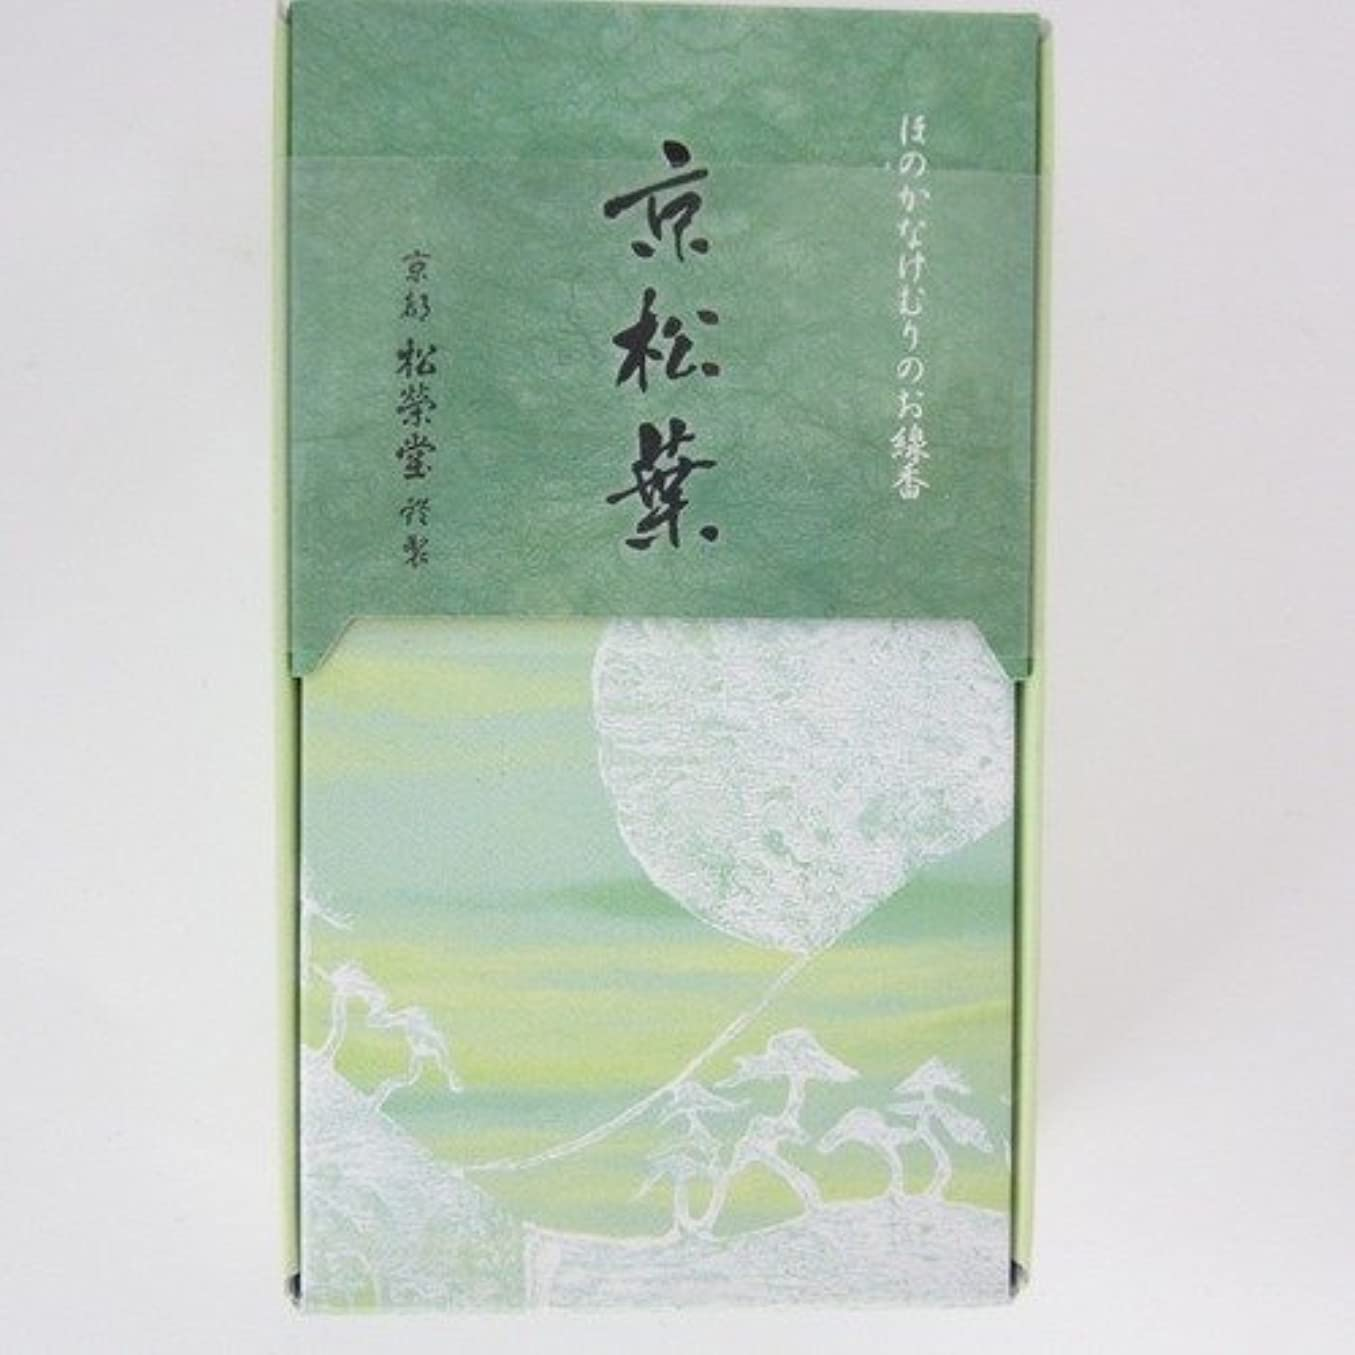 信念親側溝松栄堂 玉響シリーズ お香 京松葉 45g